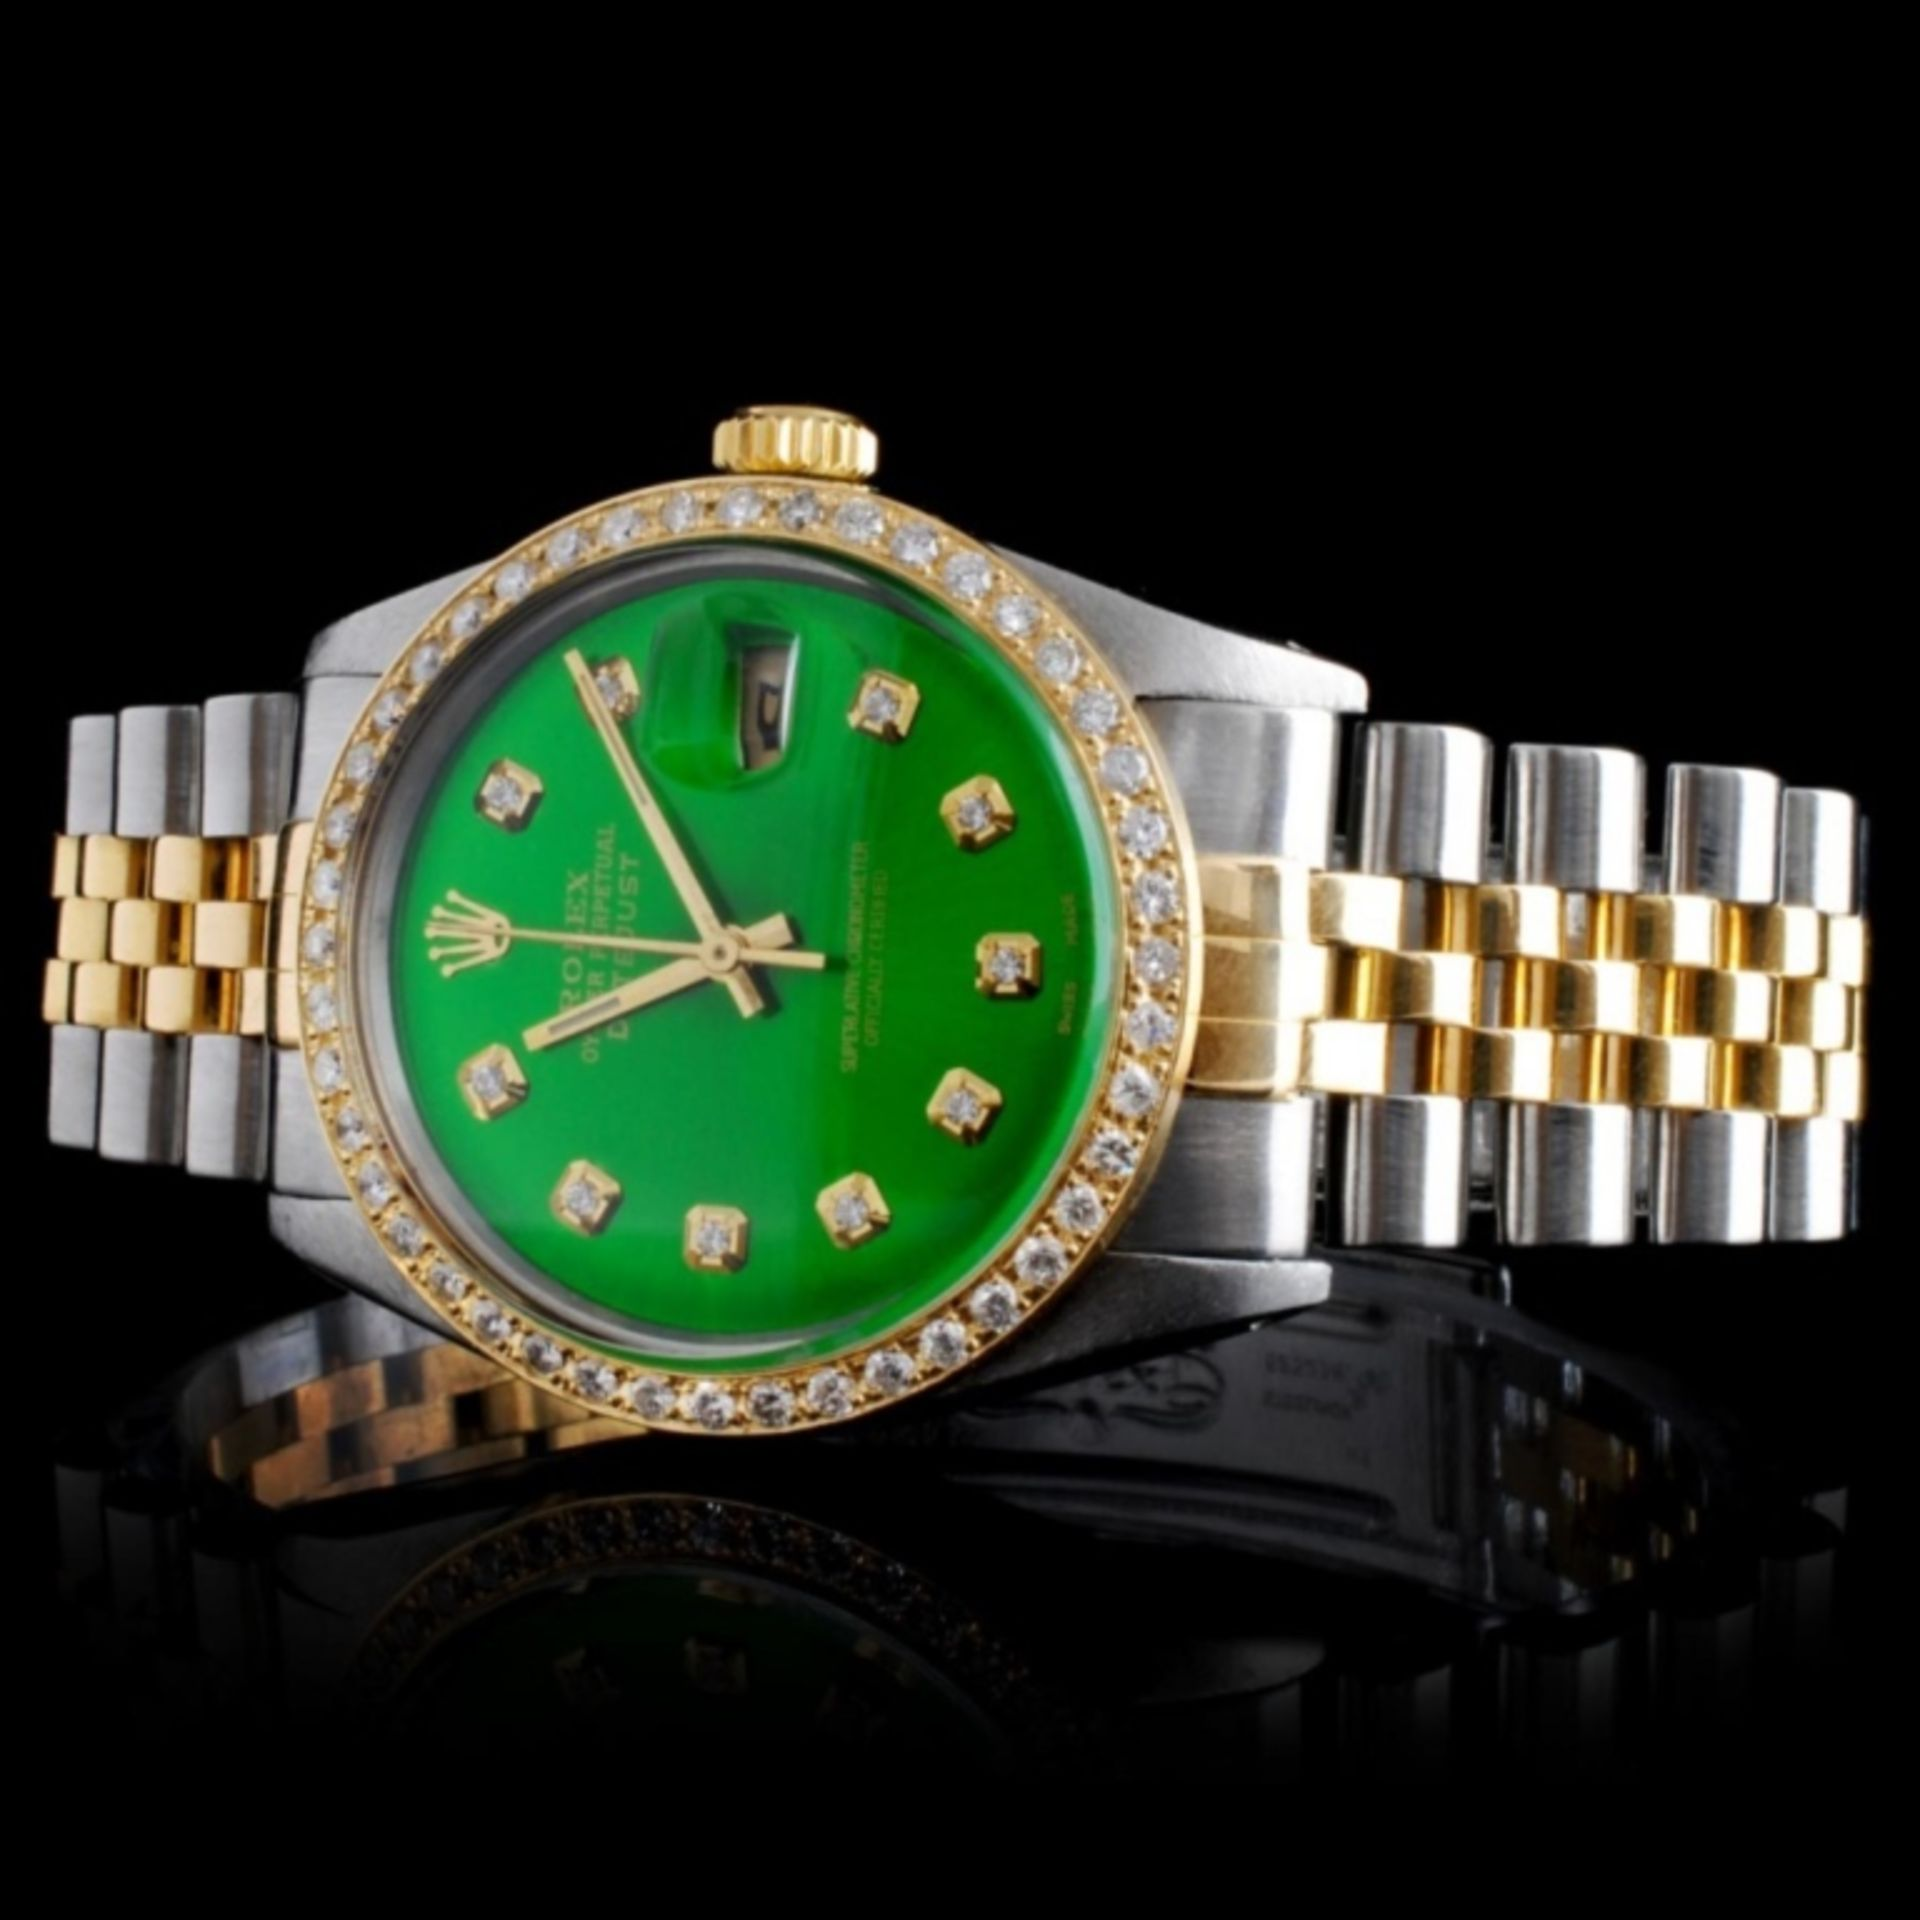 Rolex YG/SS DateJust Diamond 36MM Watch - Image 2 of 6